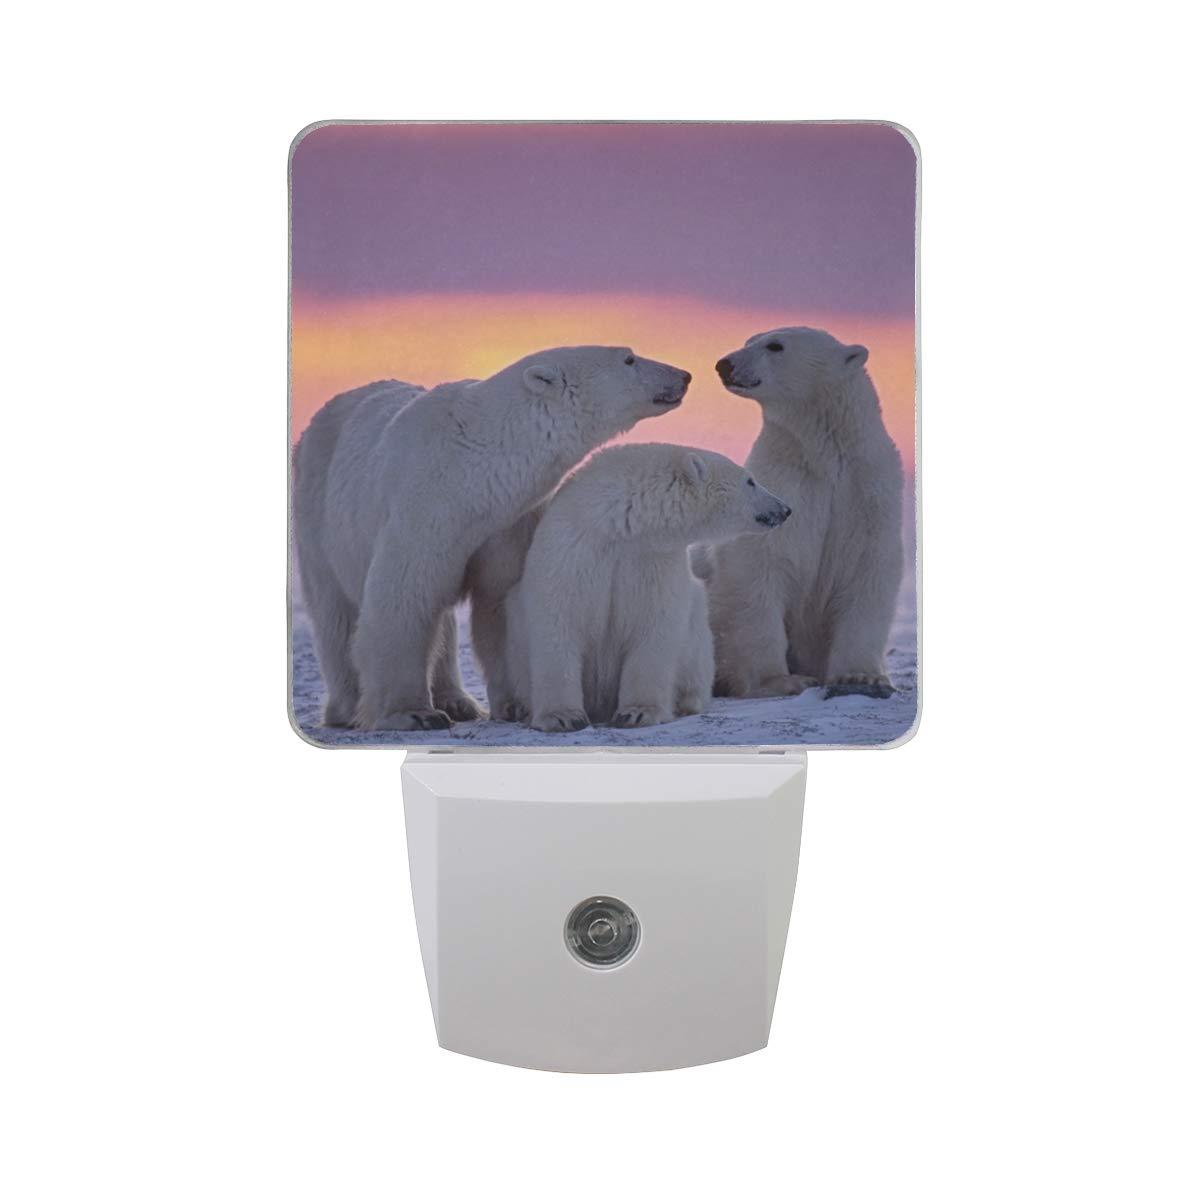 KUWT LED Night Light Polar Bear Animal Plug in Night Lamp Light with Auto Senor Dusk to Dawn for Bedroom Bathroom Hallway Stairways, 2 Pack